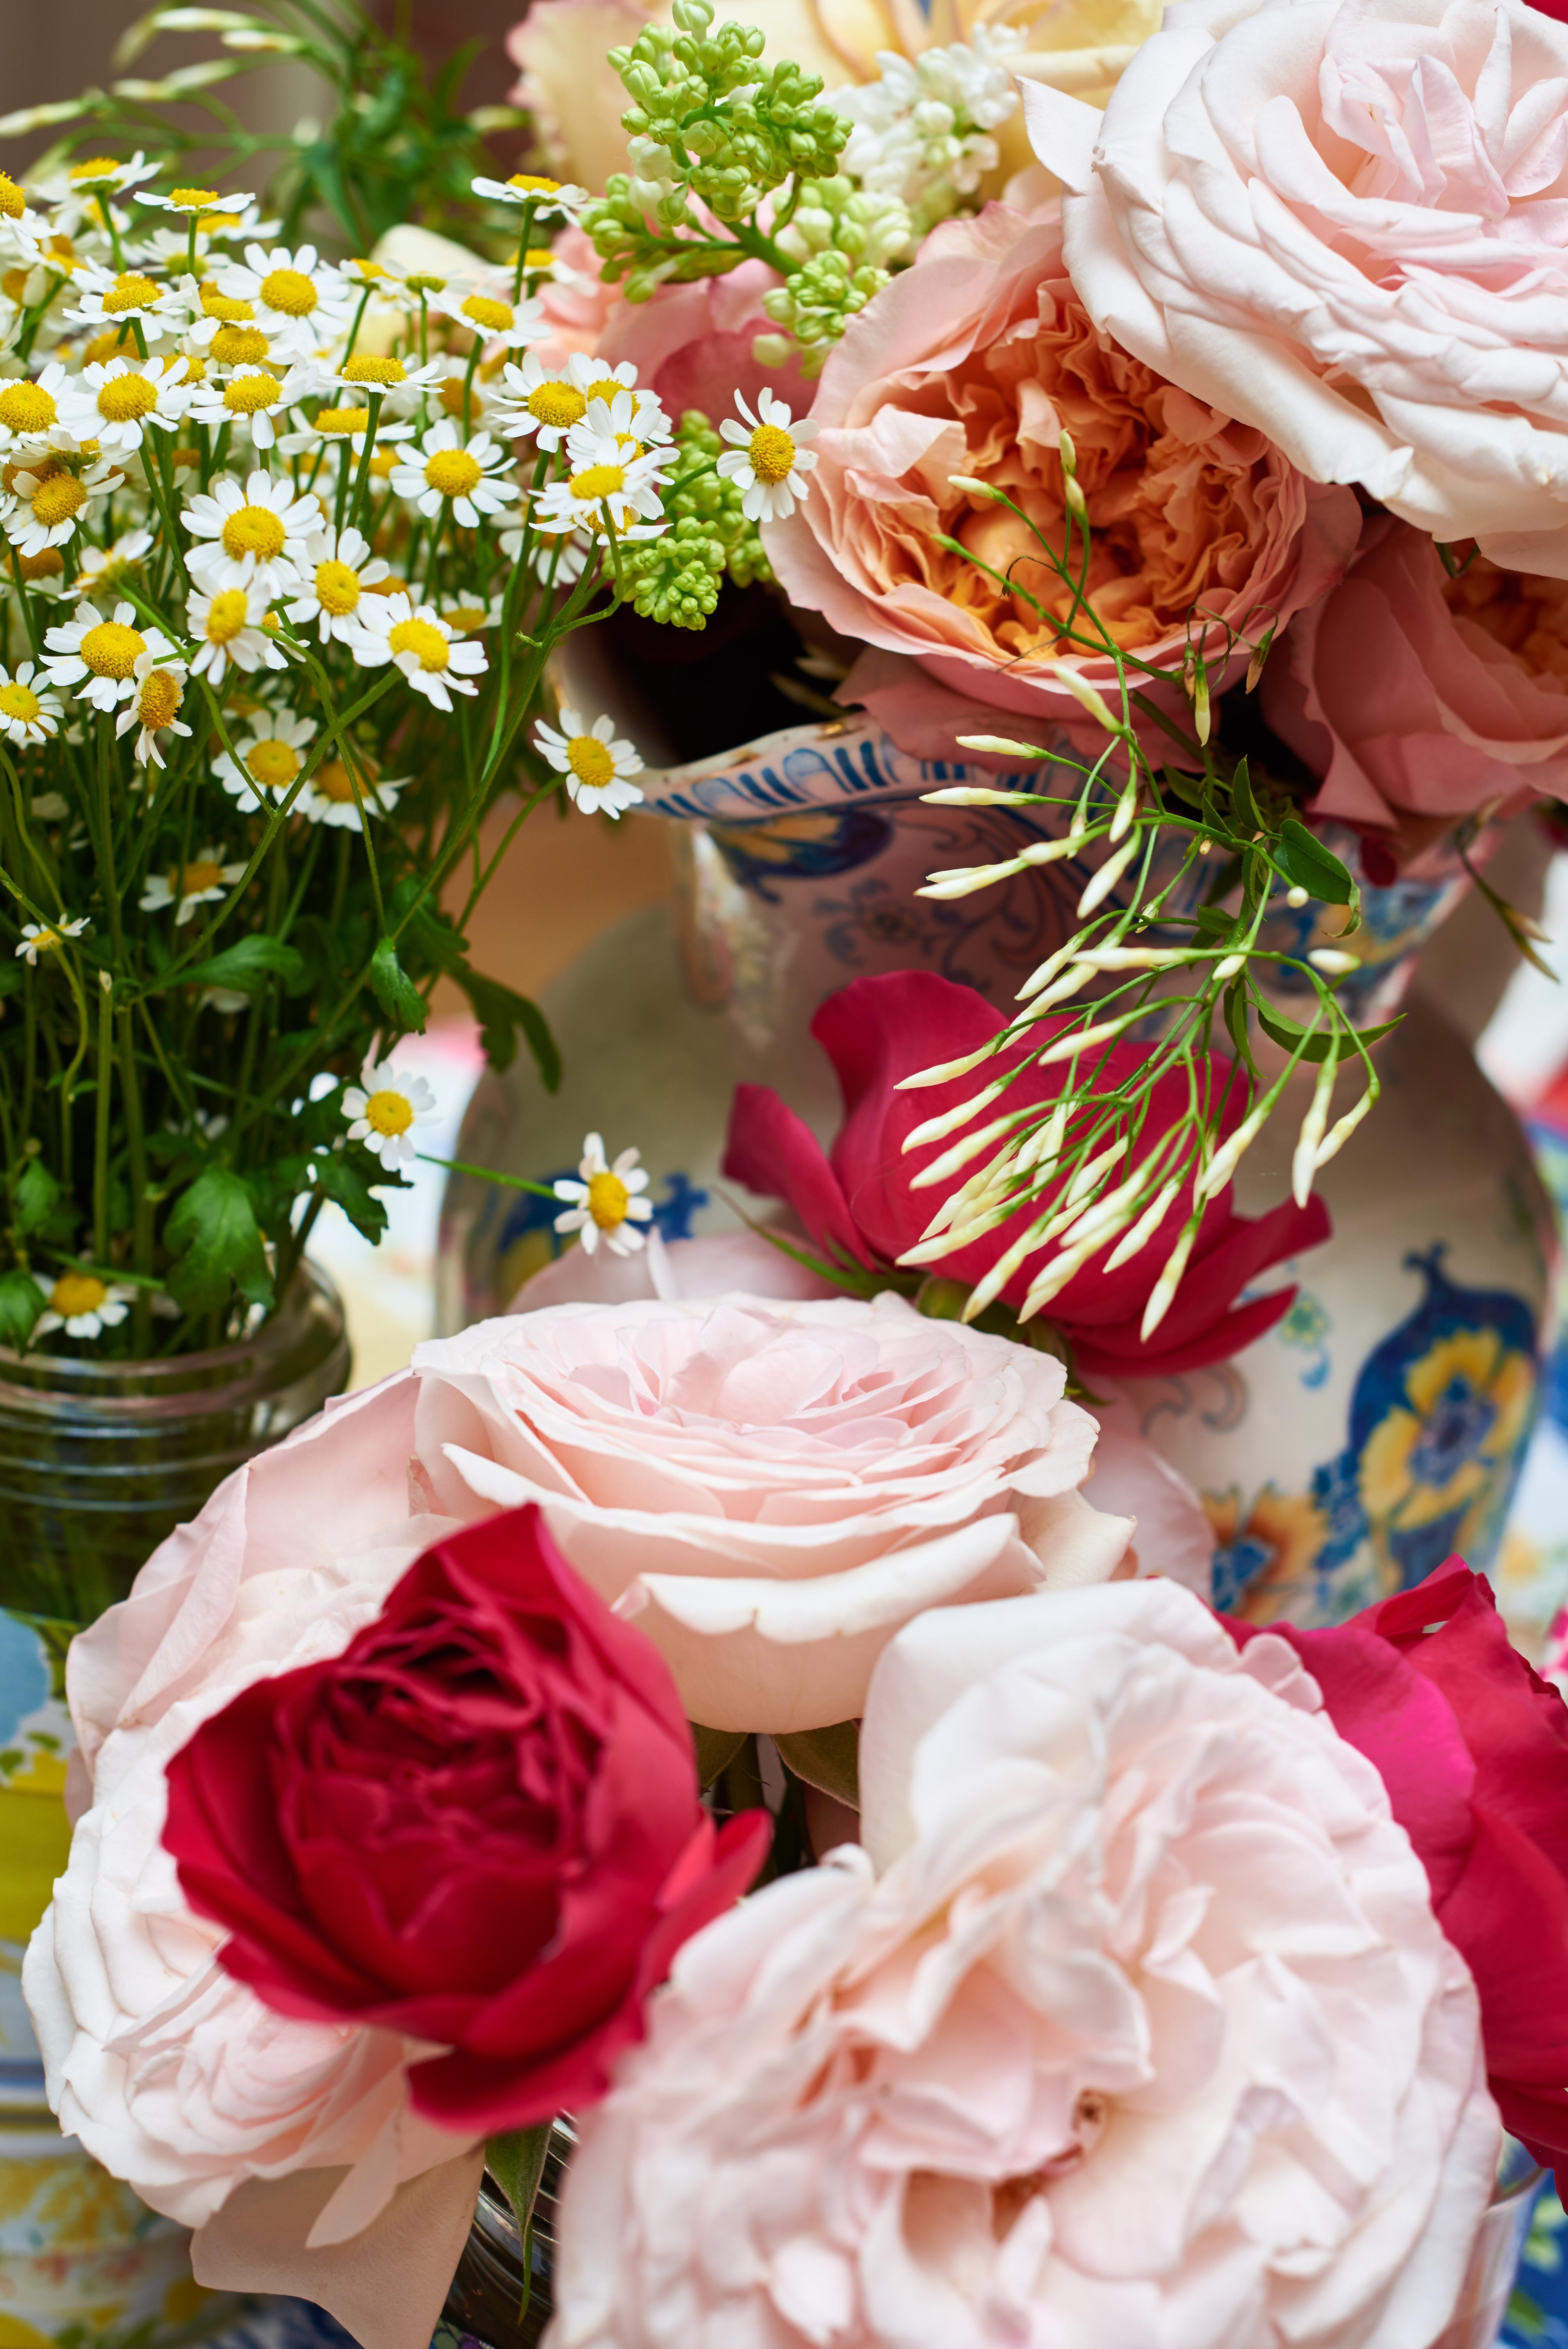 Floral Romance in an English Garden